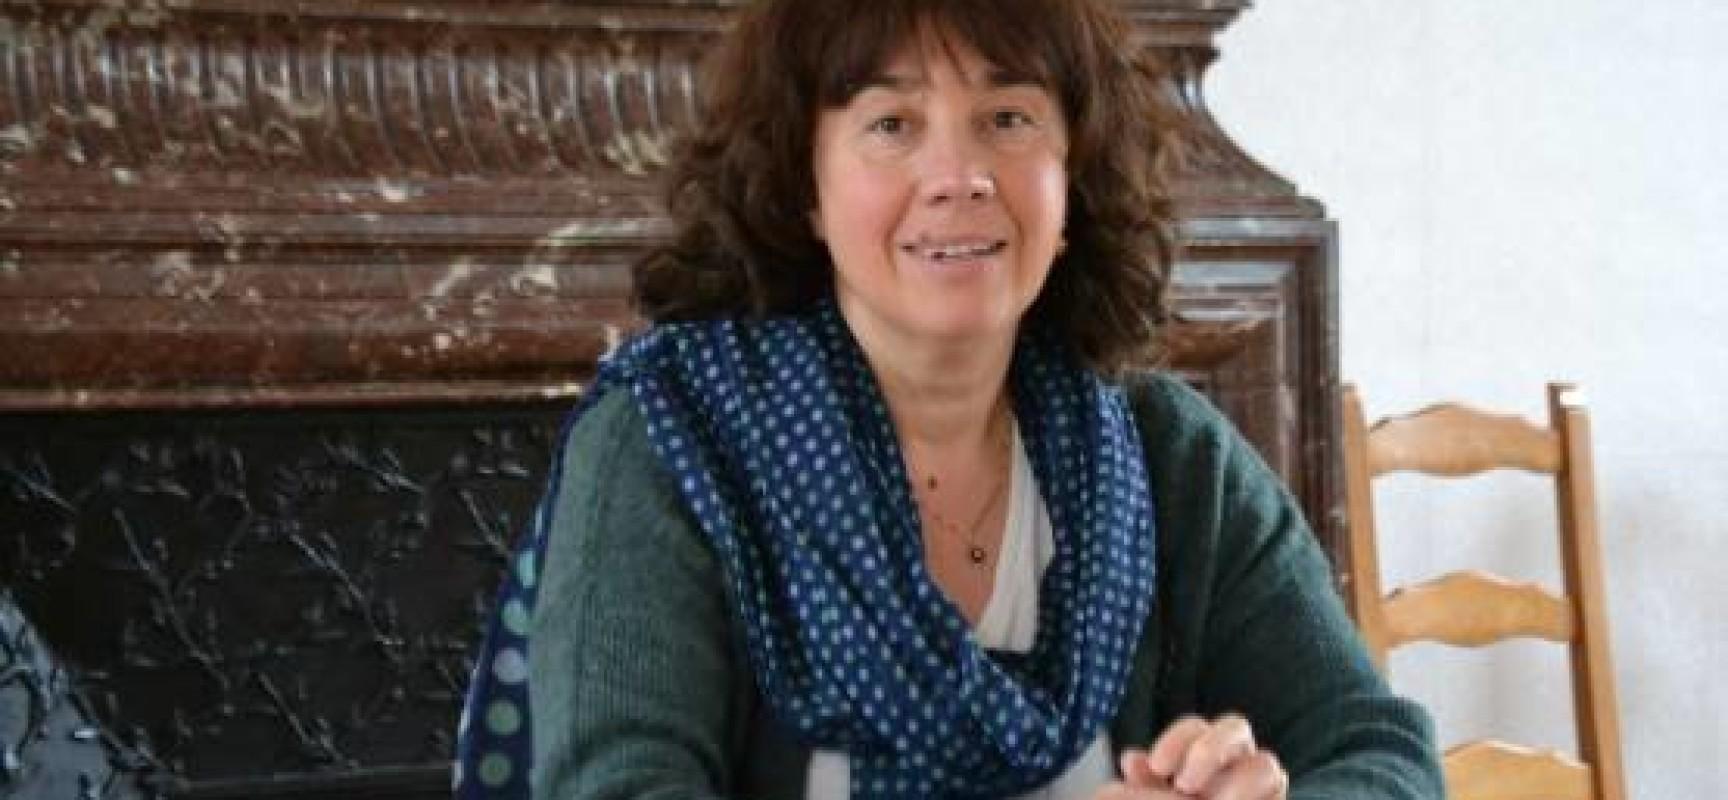 [DansLaPresse] Valérie Bertin, présidente de Creuse Grand Sud : « On doit retrouver de l'apaisement »